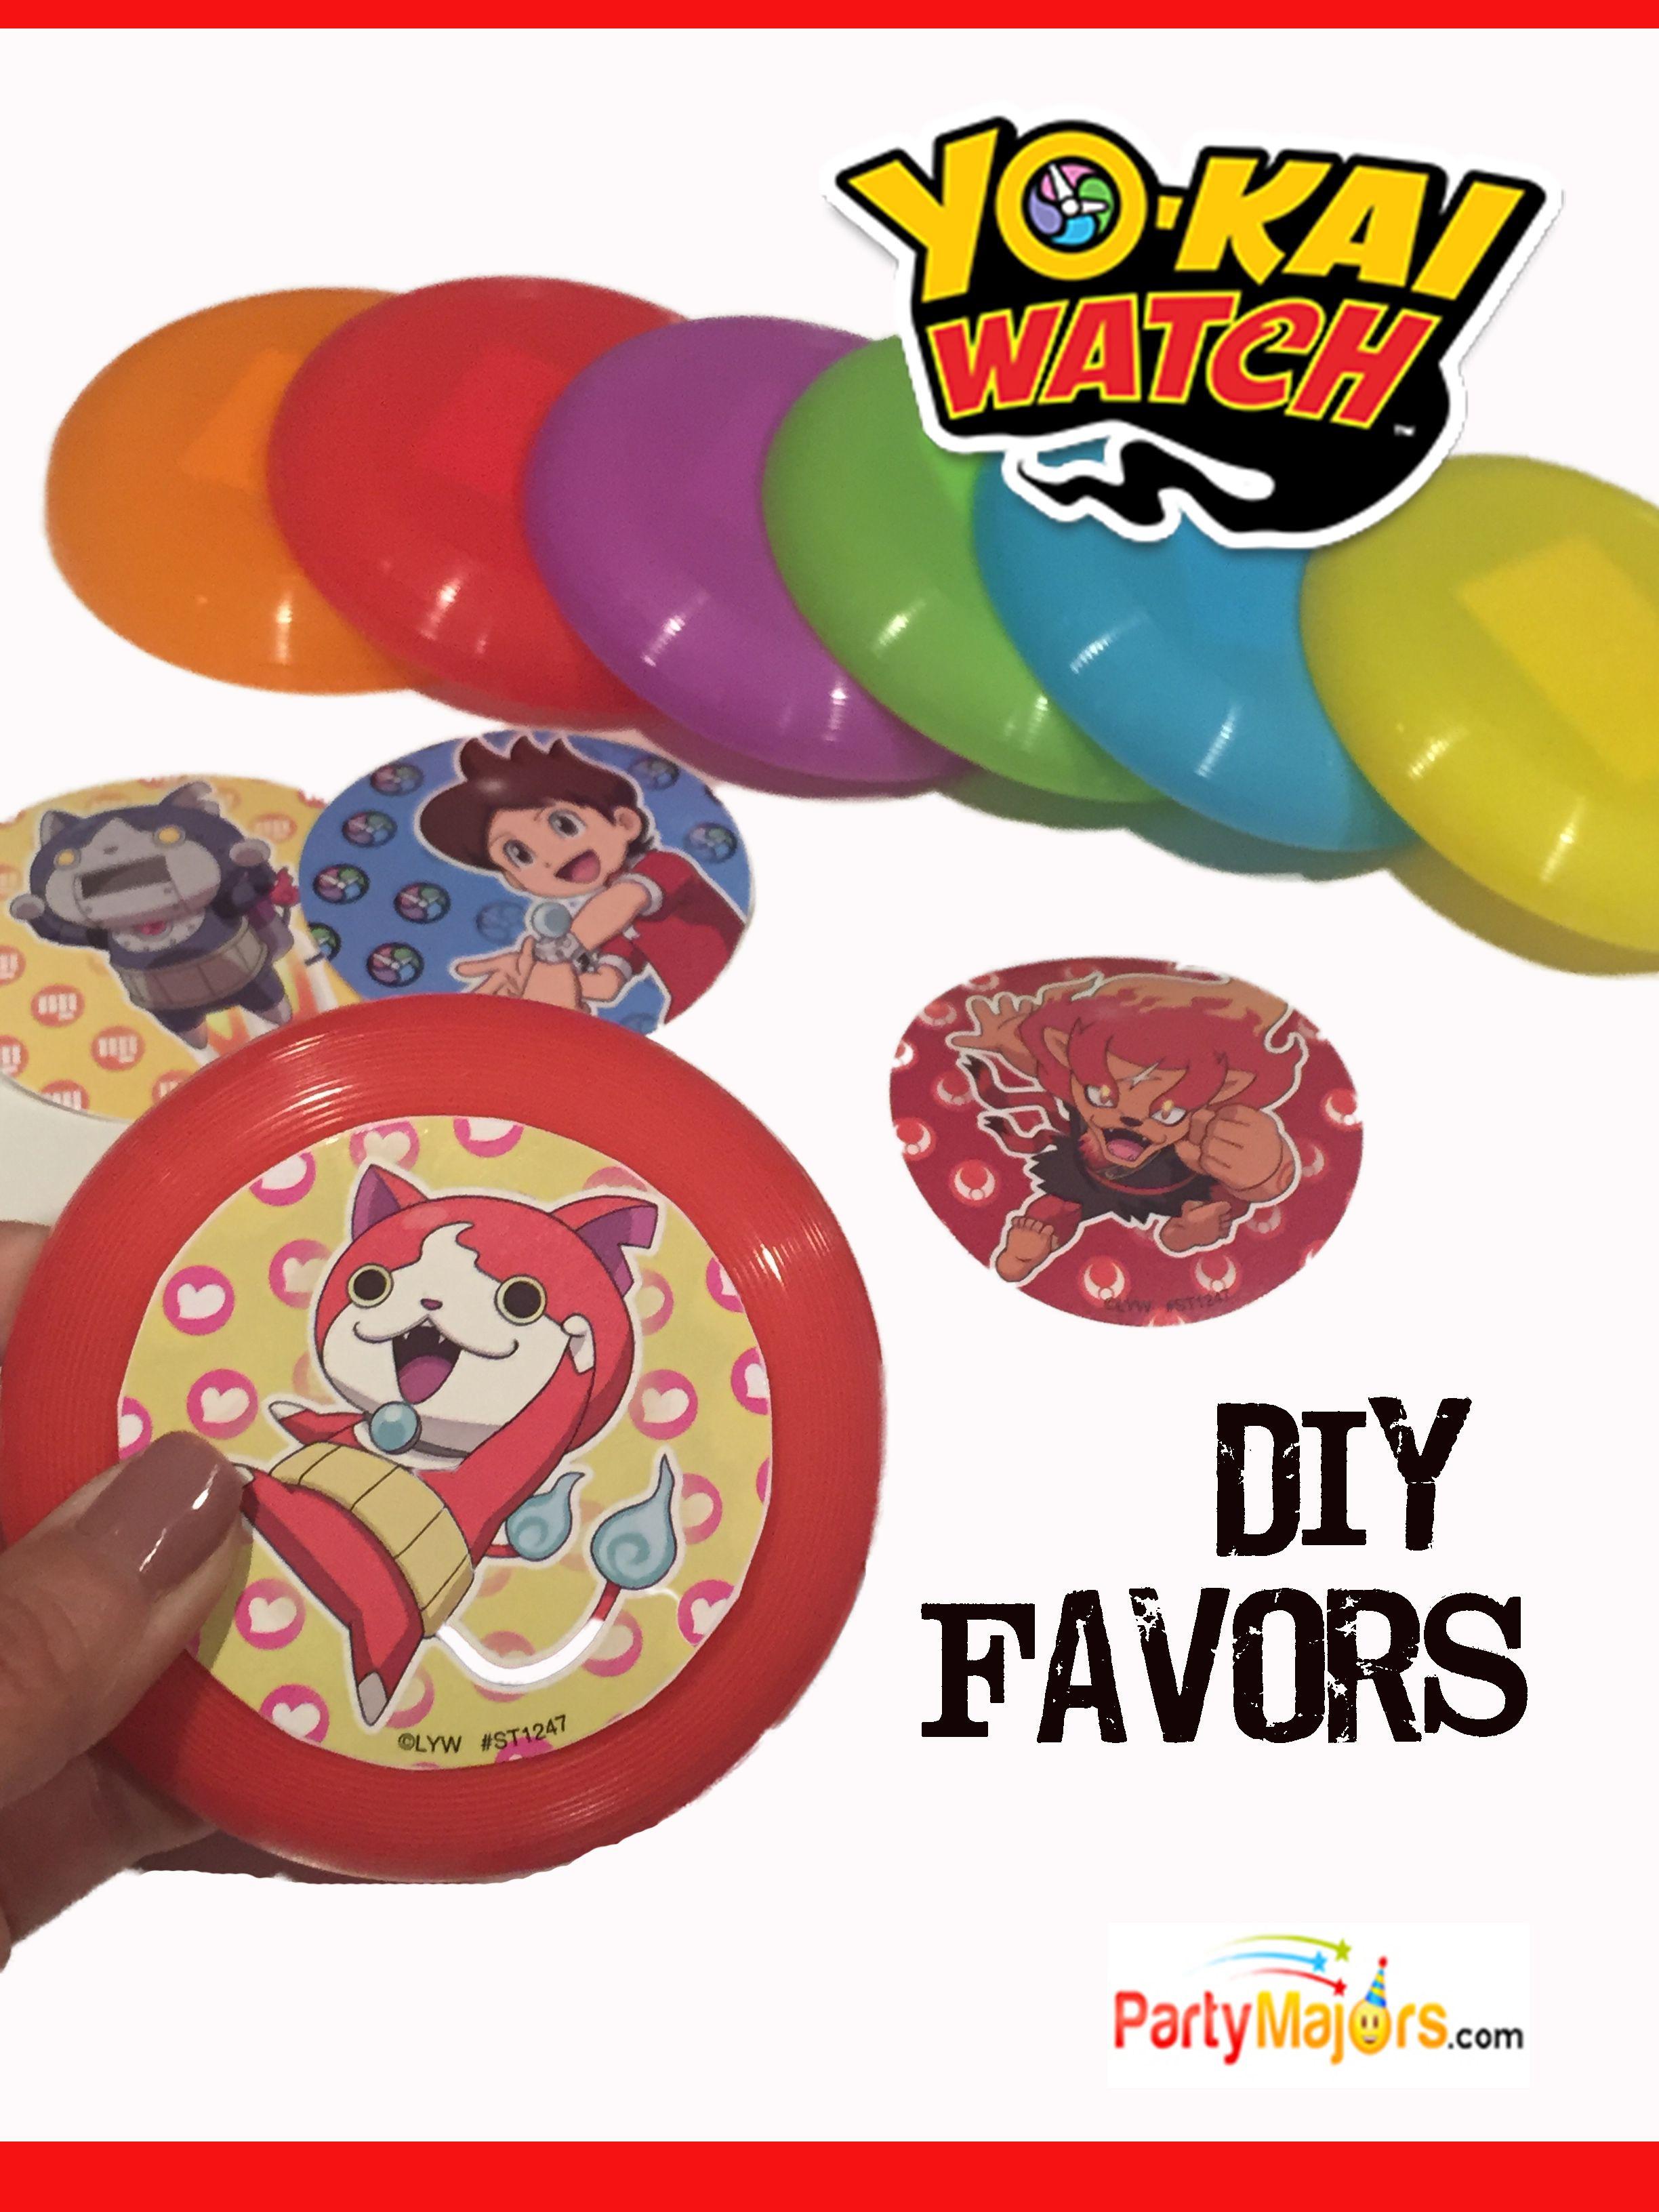 Yo kai watch party diy favors make frisbees from stickers cheap easy yokai favors